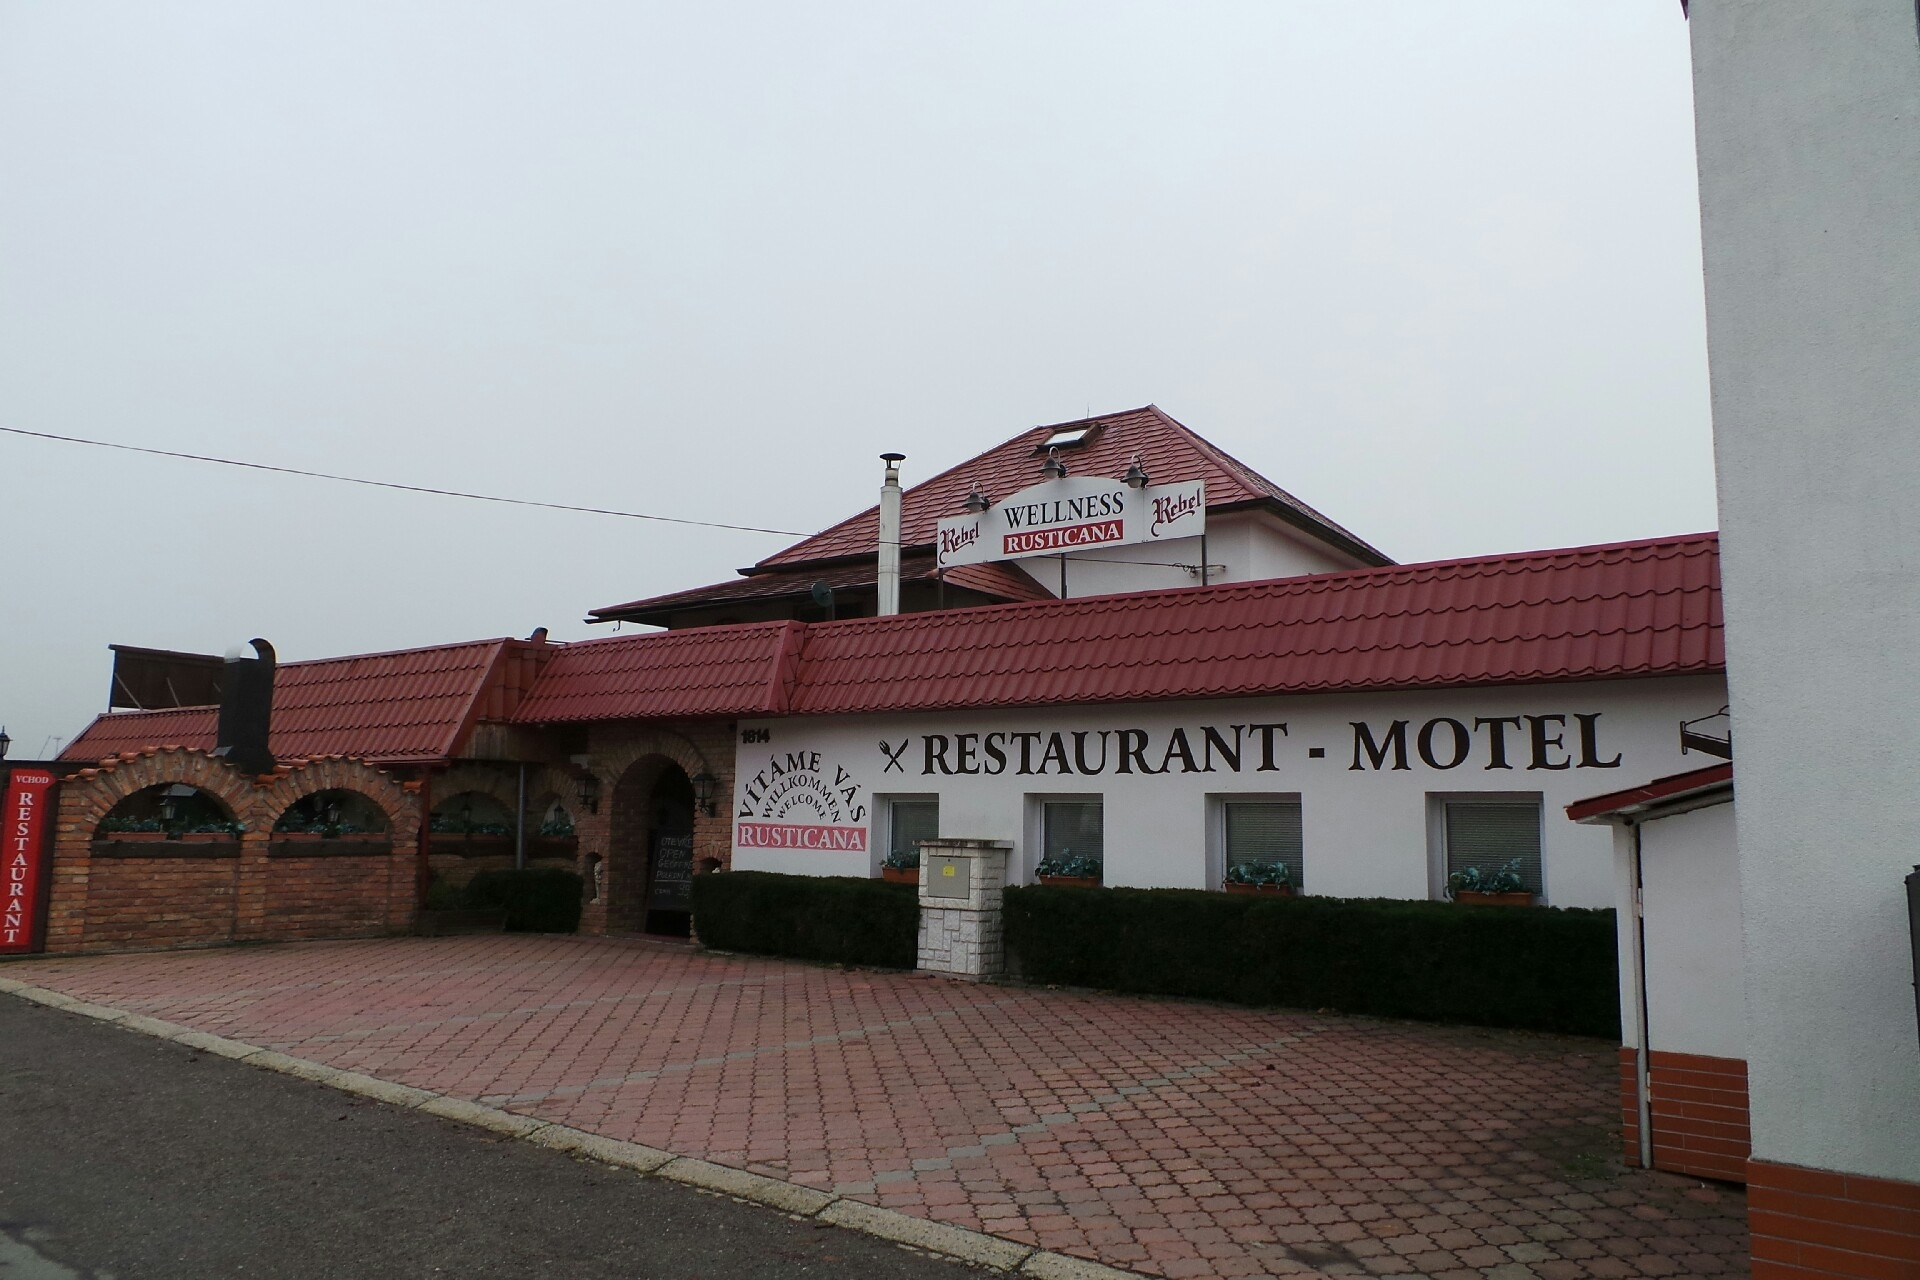 Motel Rusticana